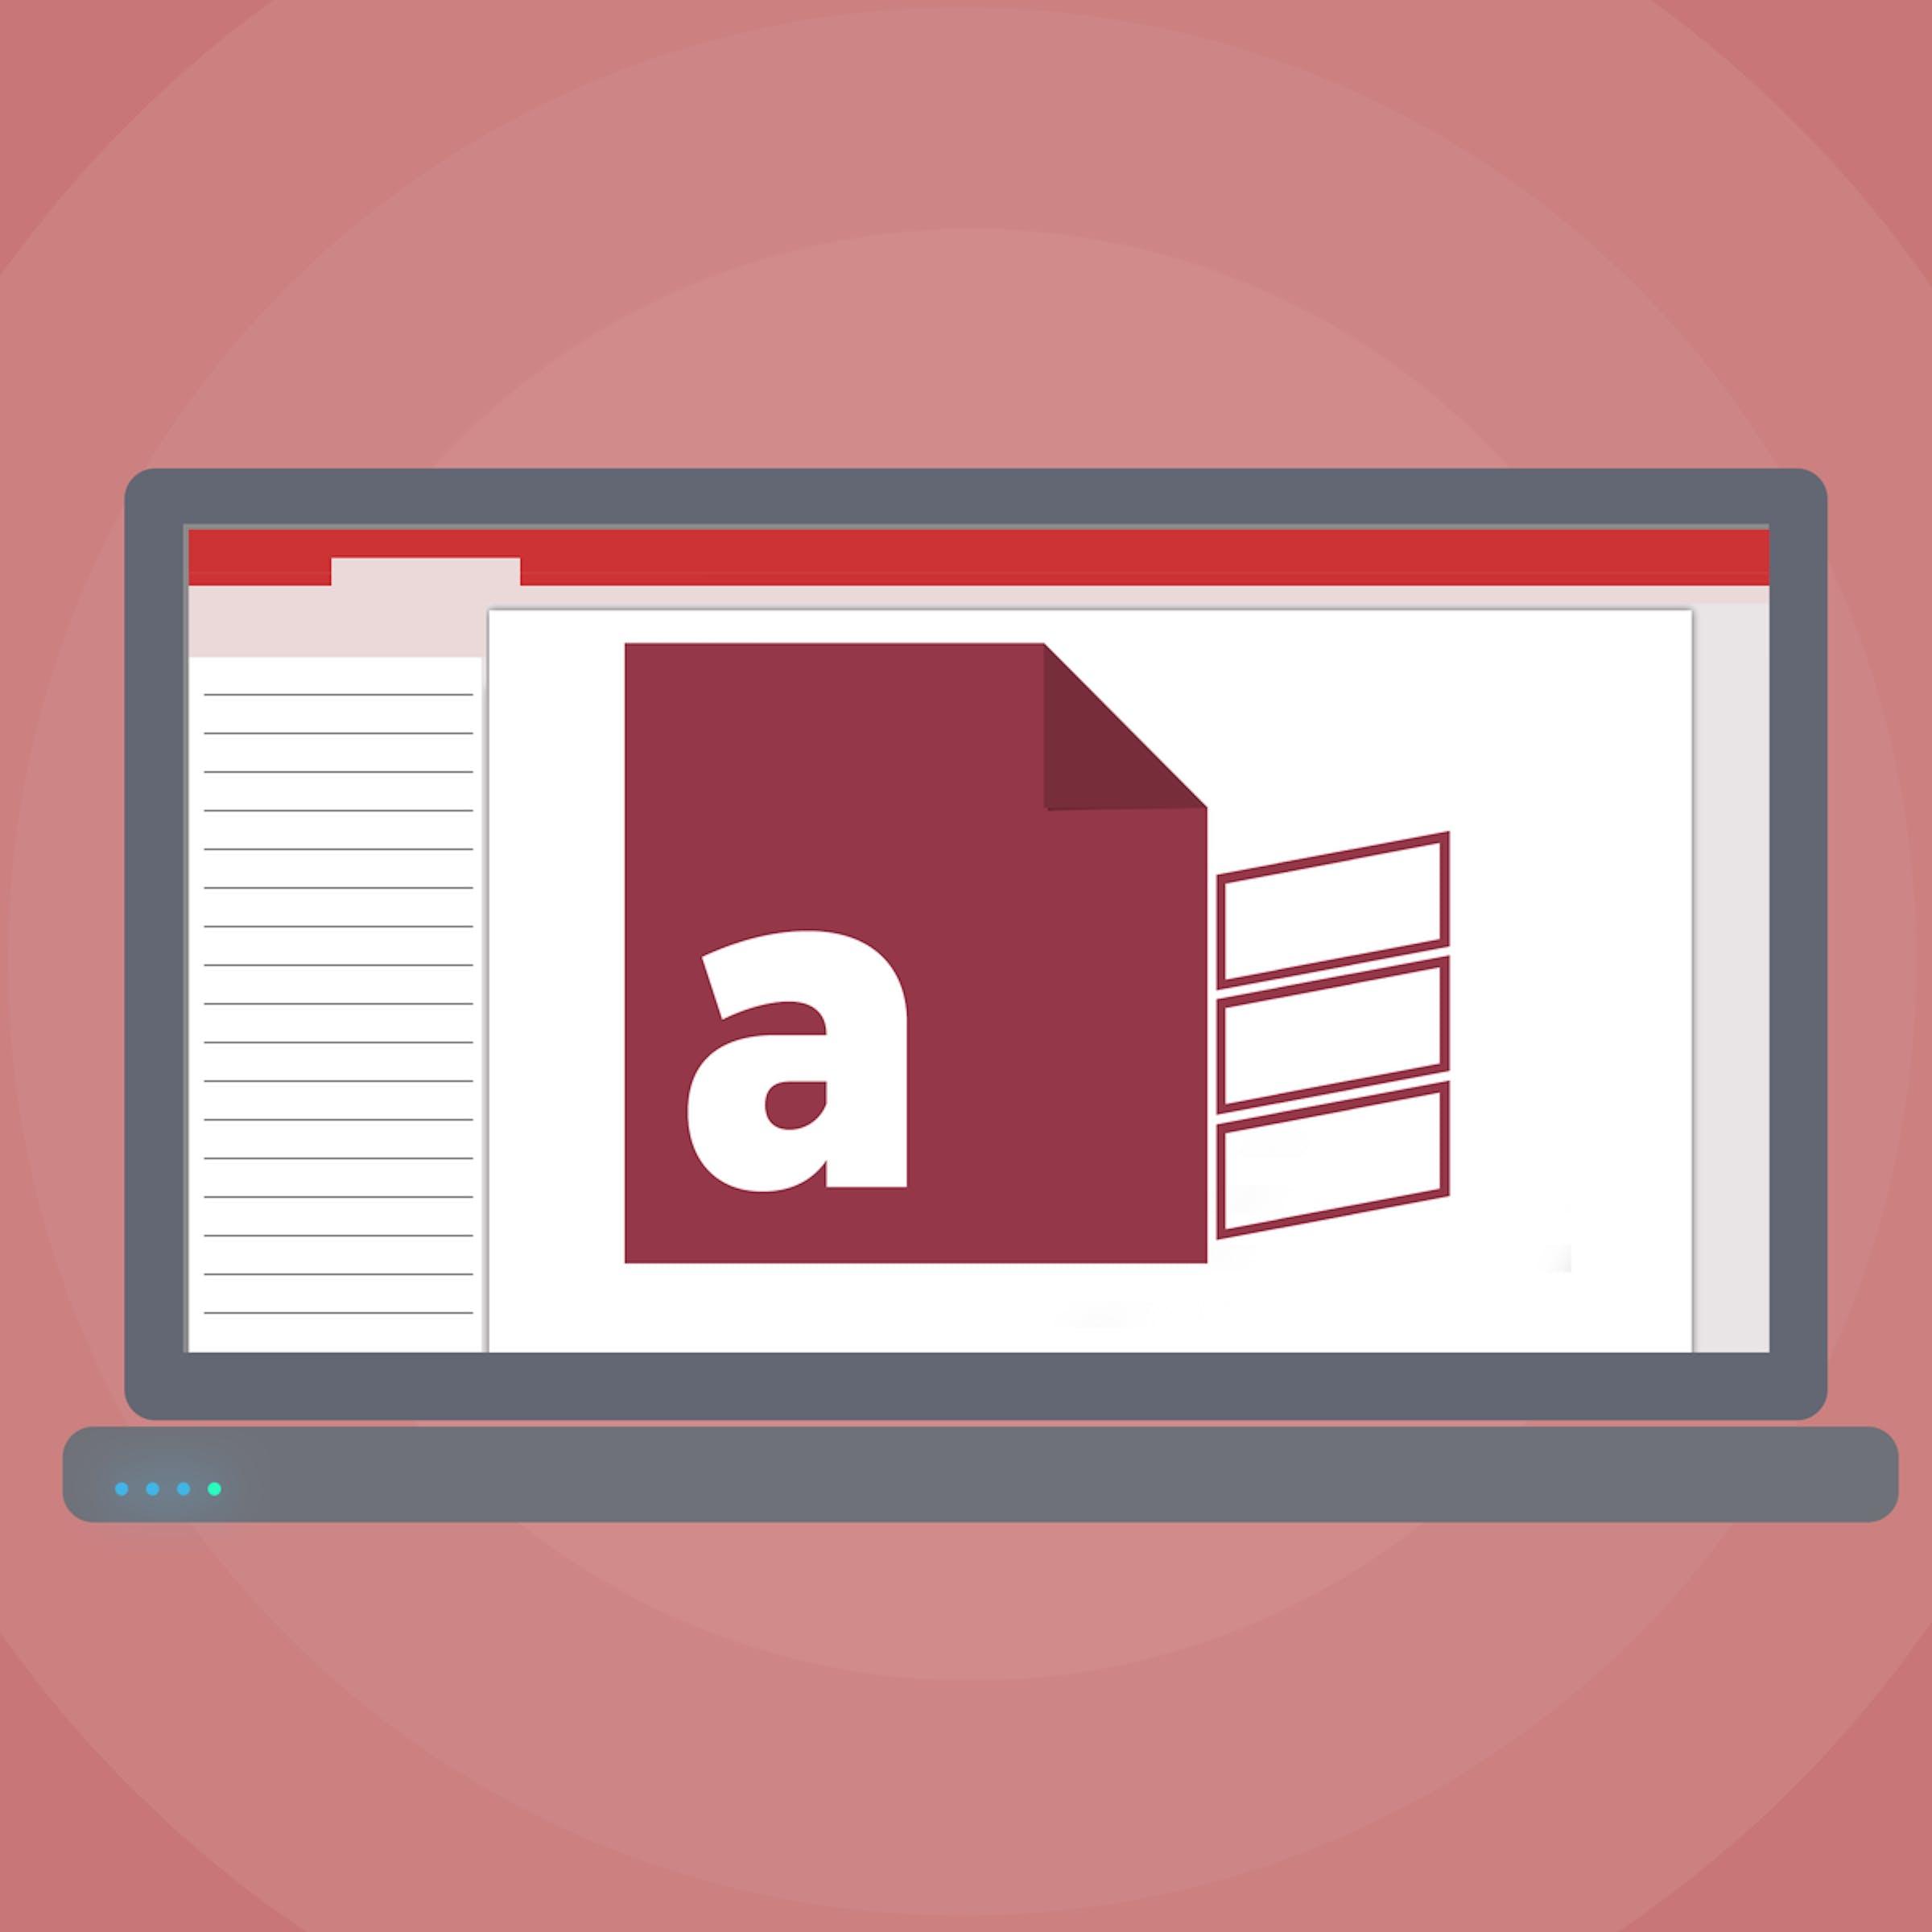 free online courses for https://d3njjcbhbojbot.cloudfront.net/api/utilities/v1/imageproxy/https://s3.amazonaws.com/coursera-course-photos/0a/ba35c7f66743d3b303c90c55b27354/3.-Access.png?auto=format%2Ccompress&dpr=2&w